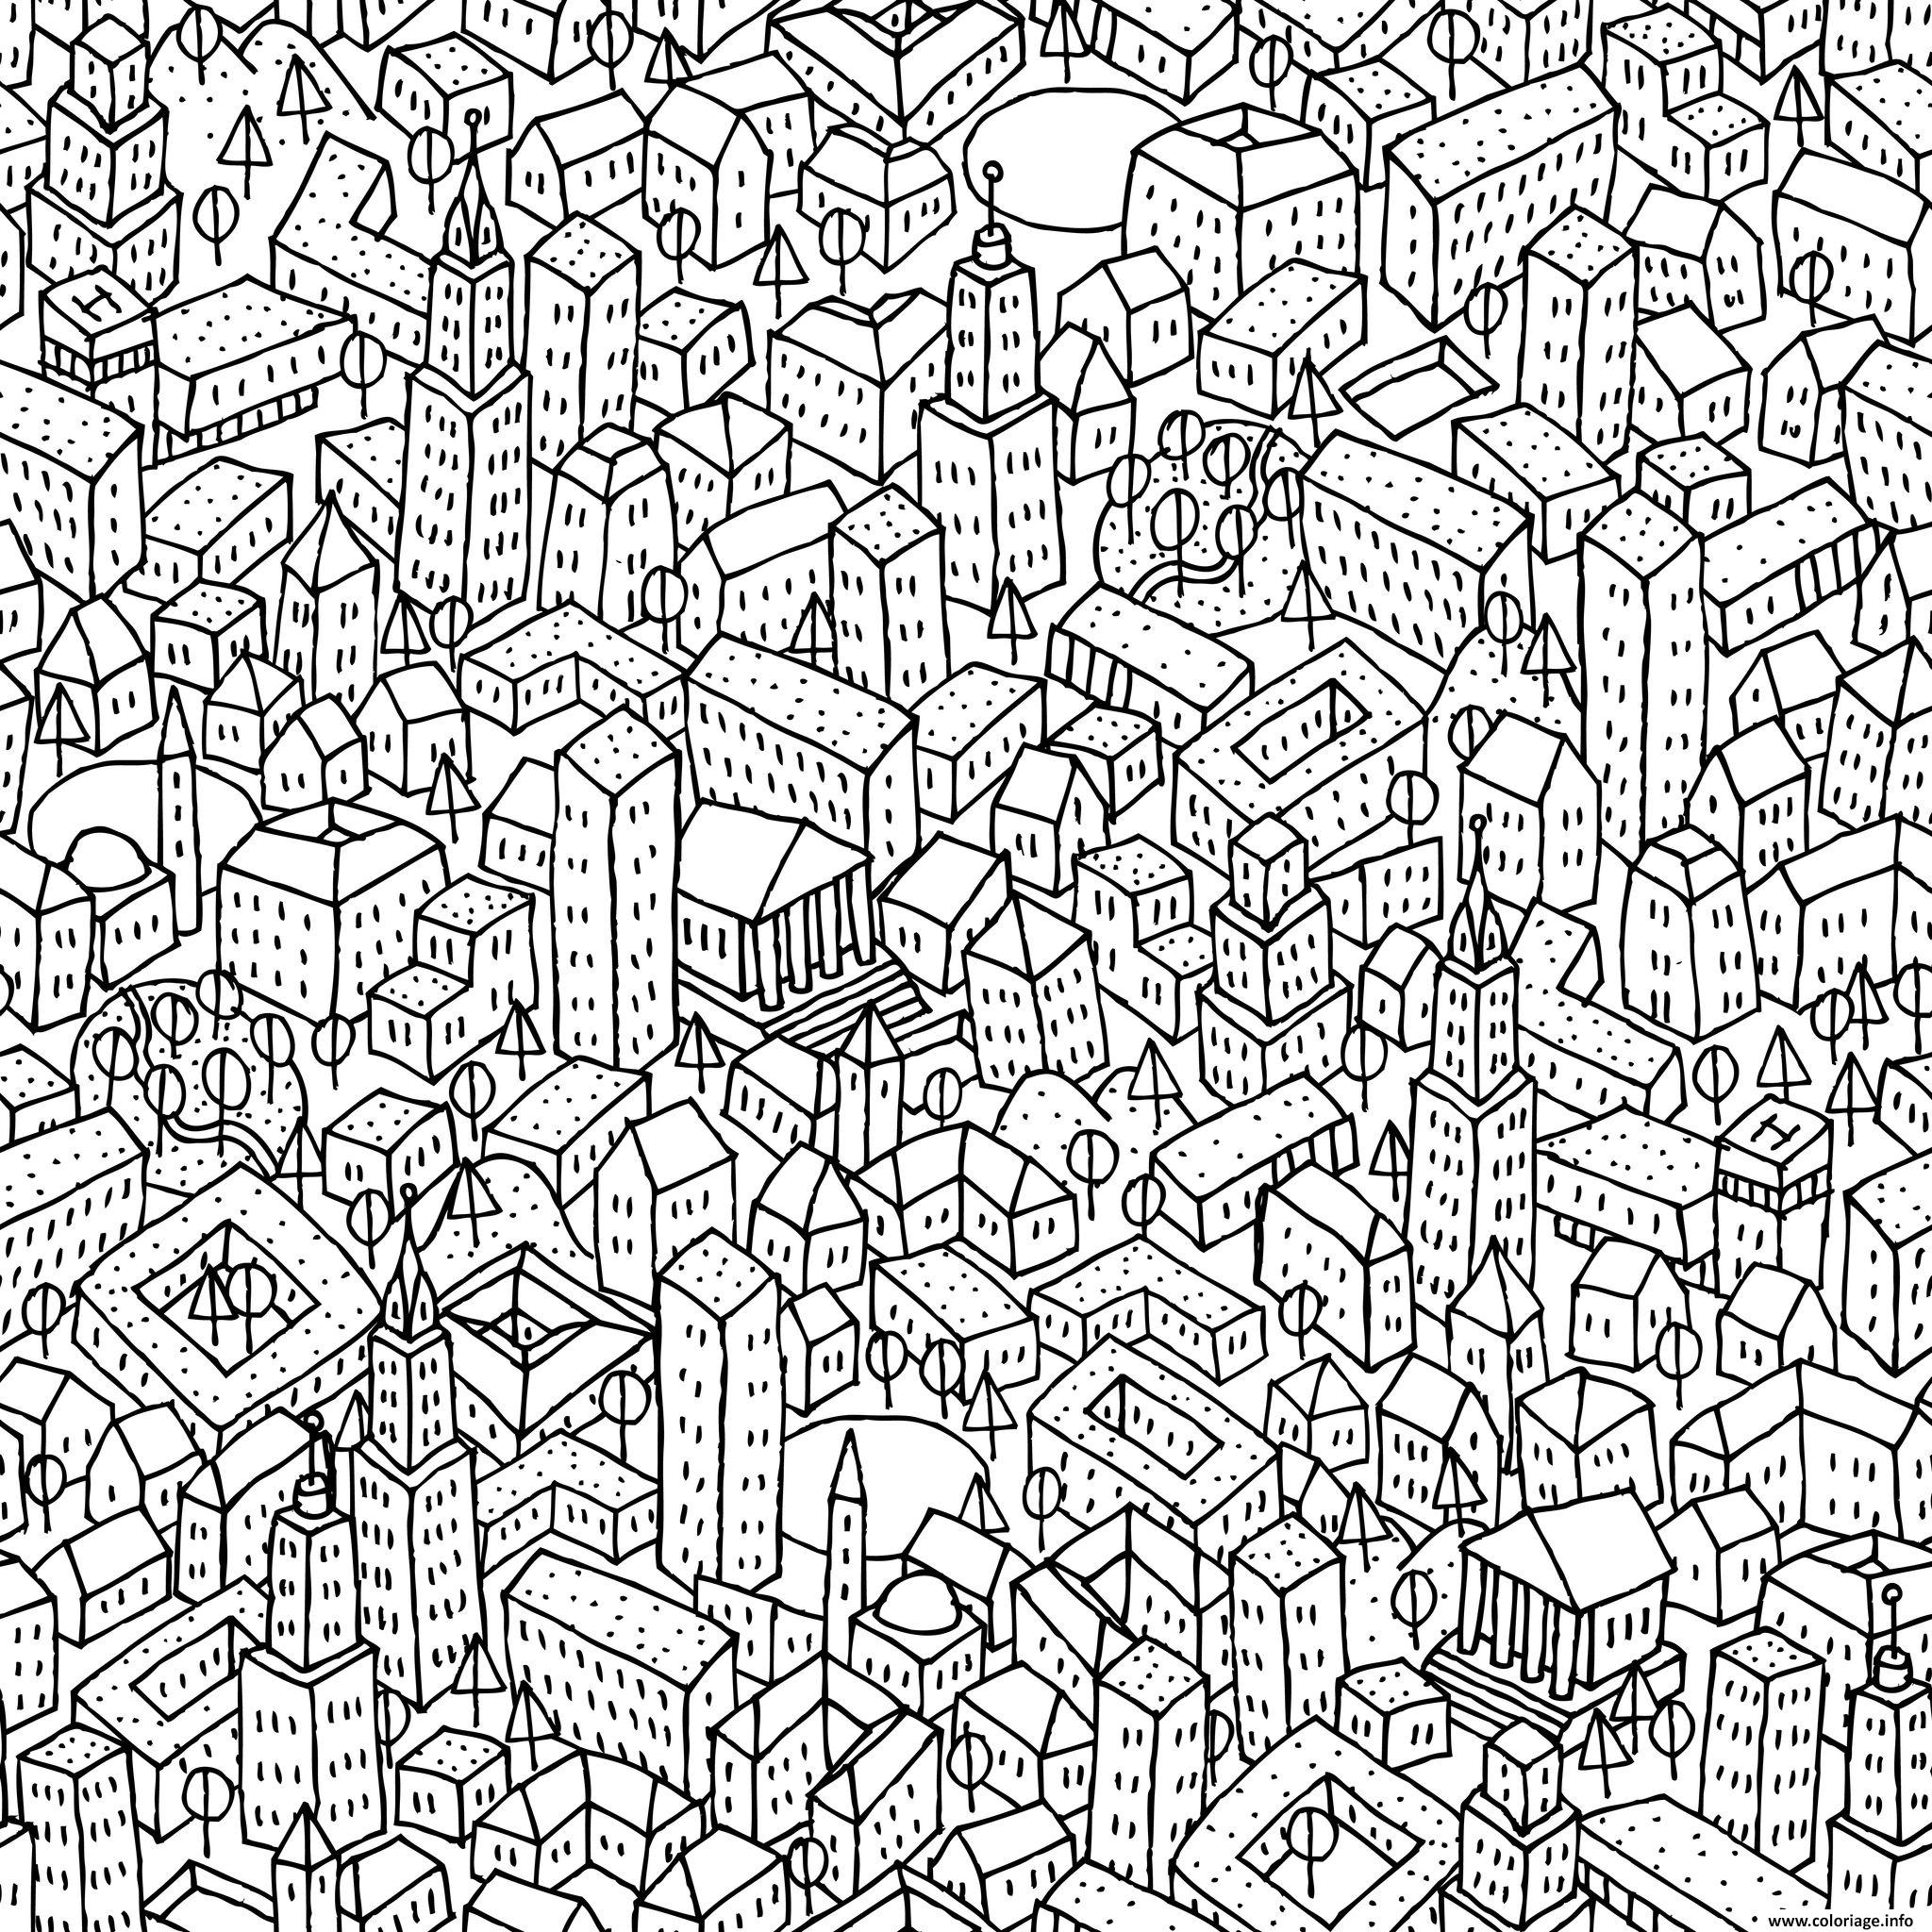 Coloriage anti stress ville paysage dessin - Dessin anti stresse ...